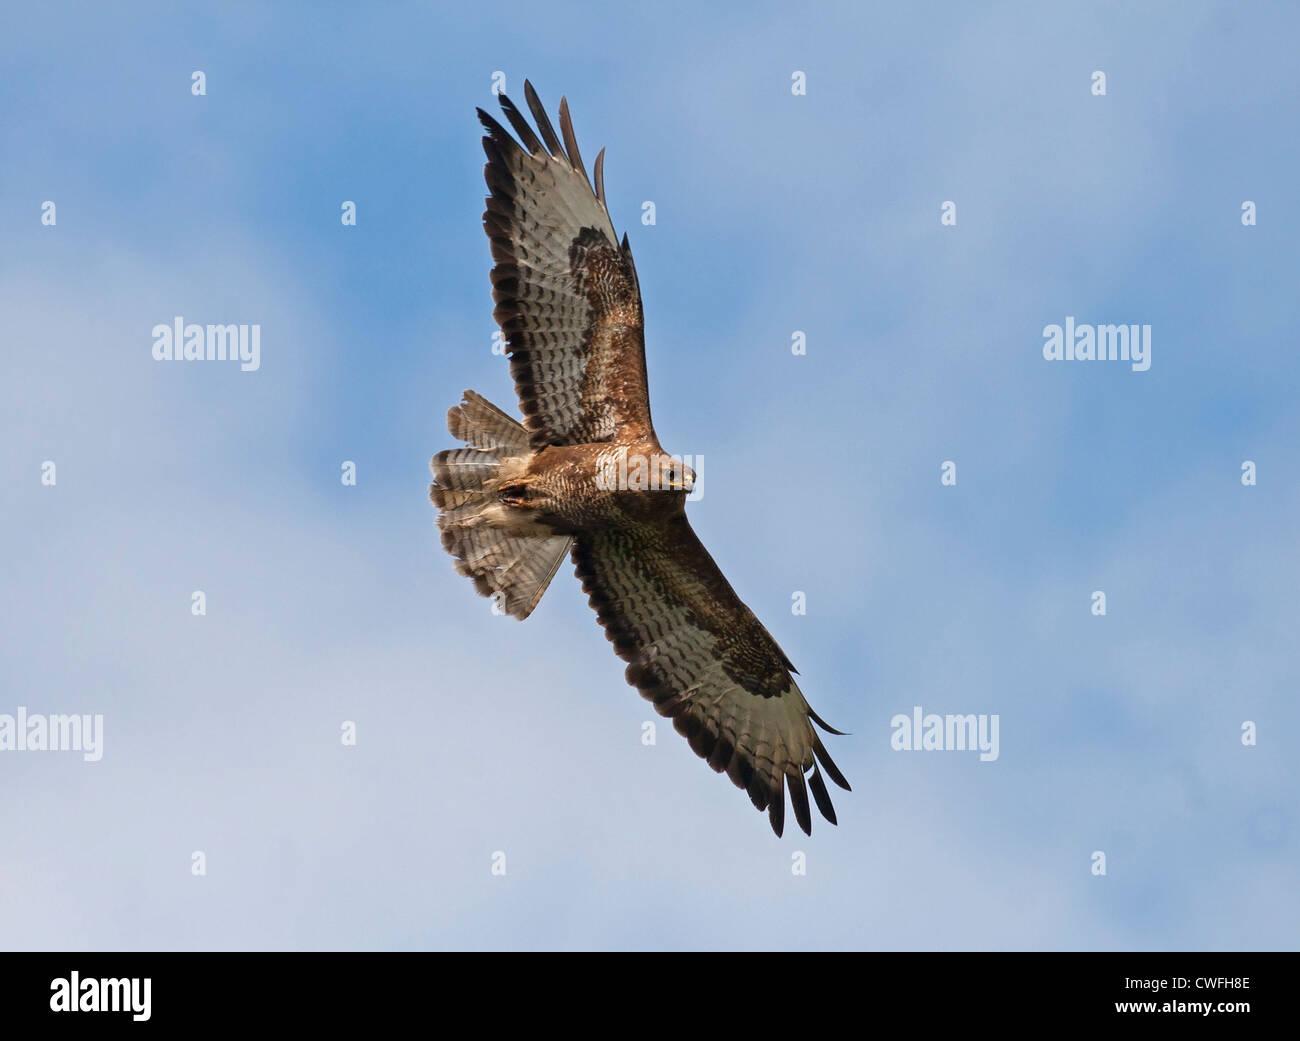 Buzzard soaring - Stock Image